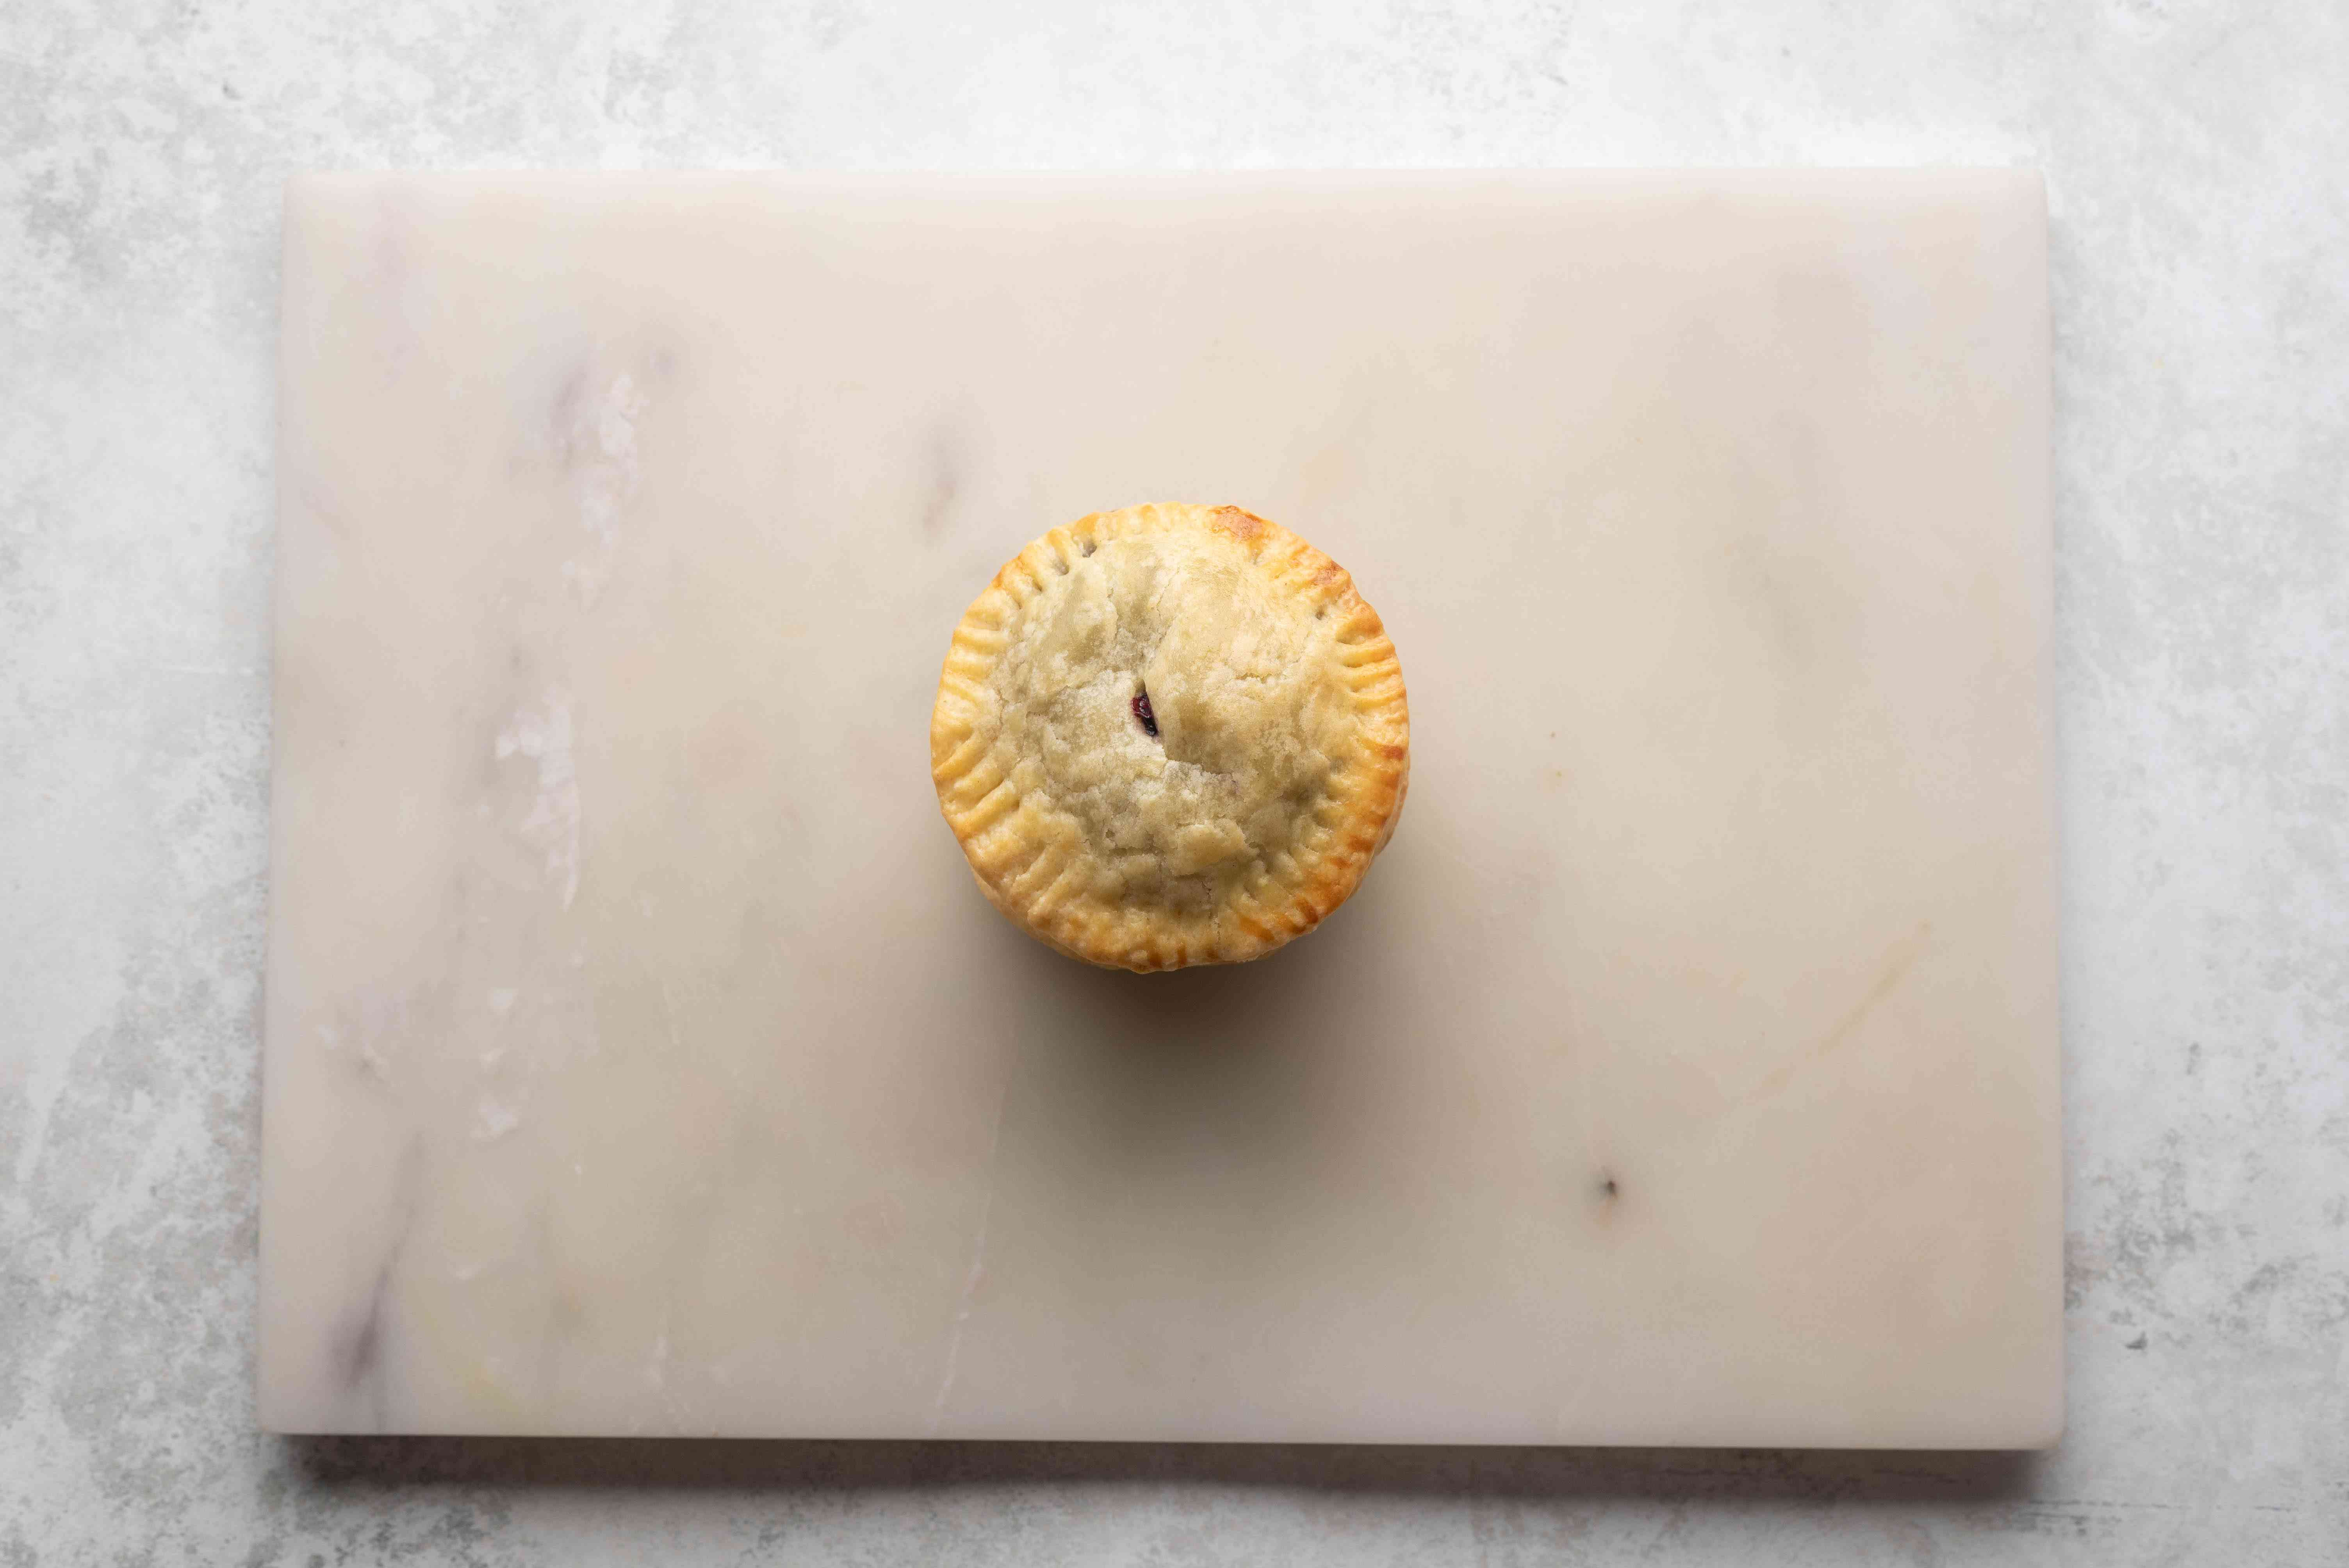 Mini Pie Ice Cream Sandwich